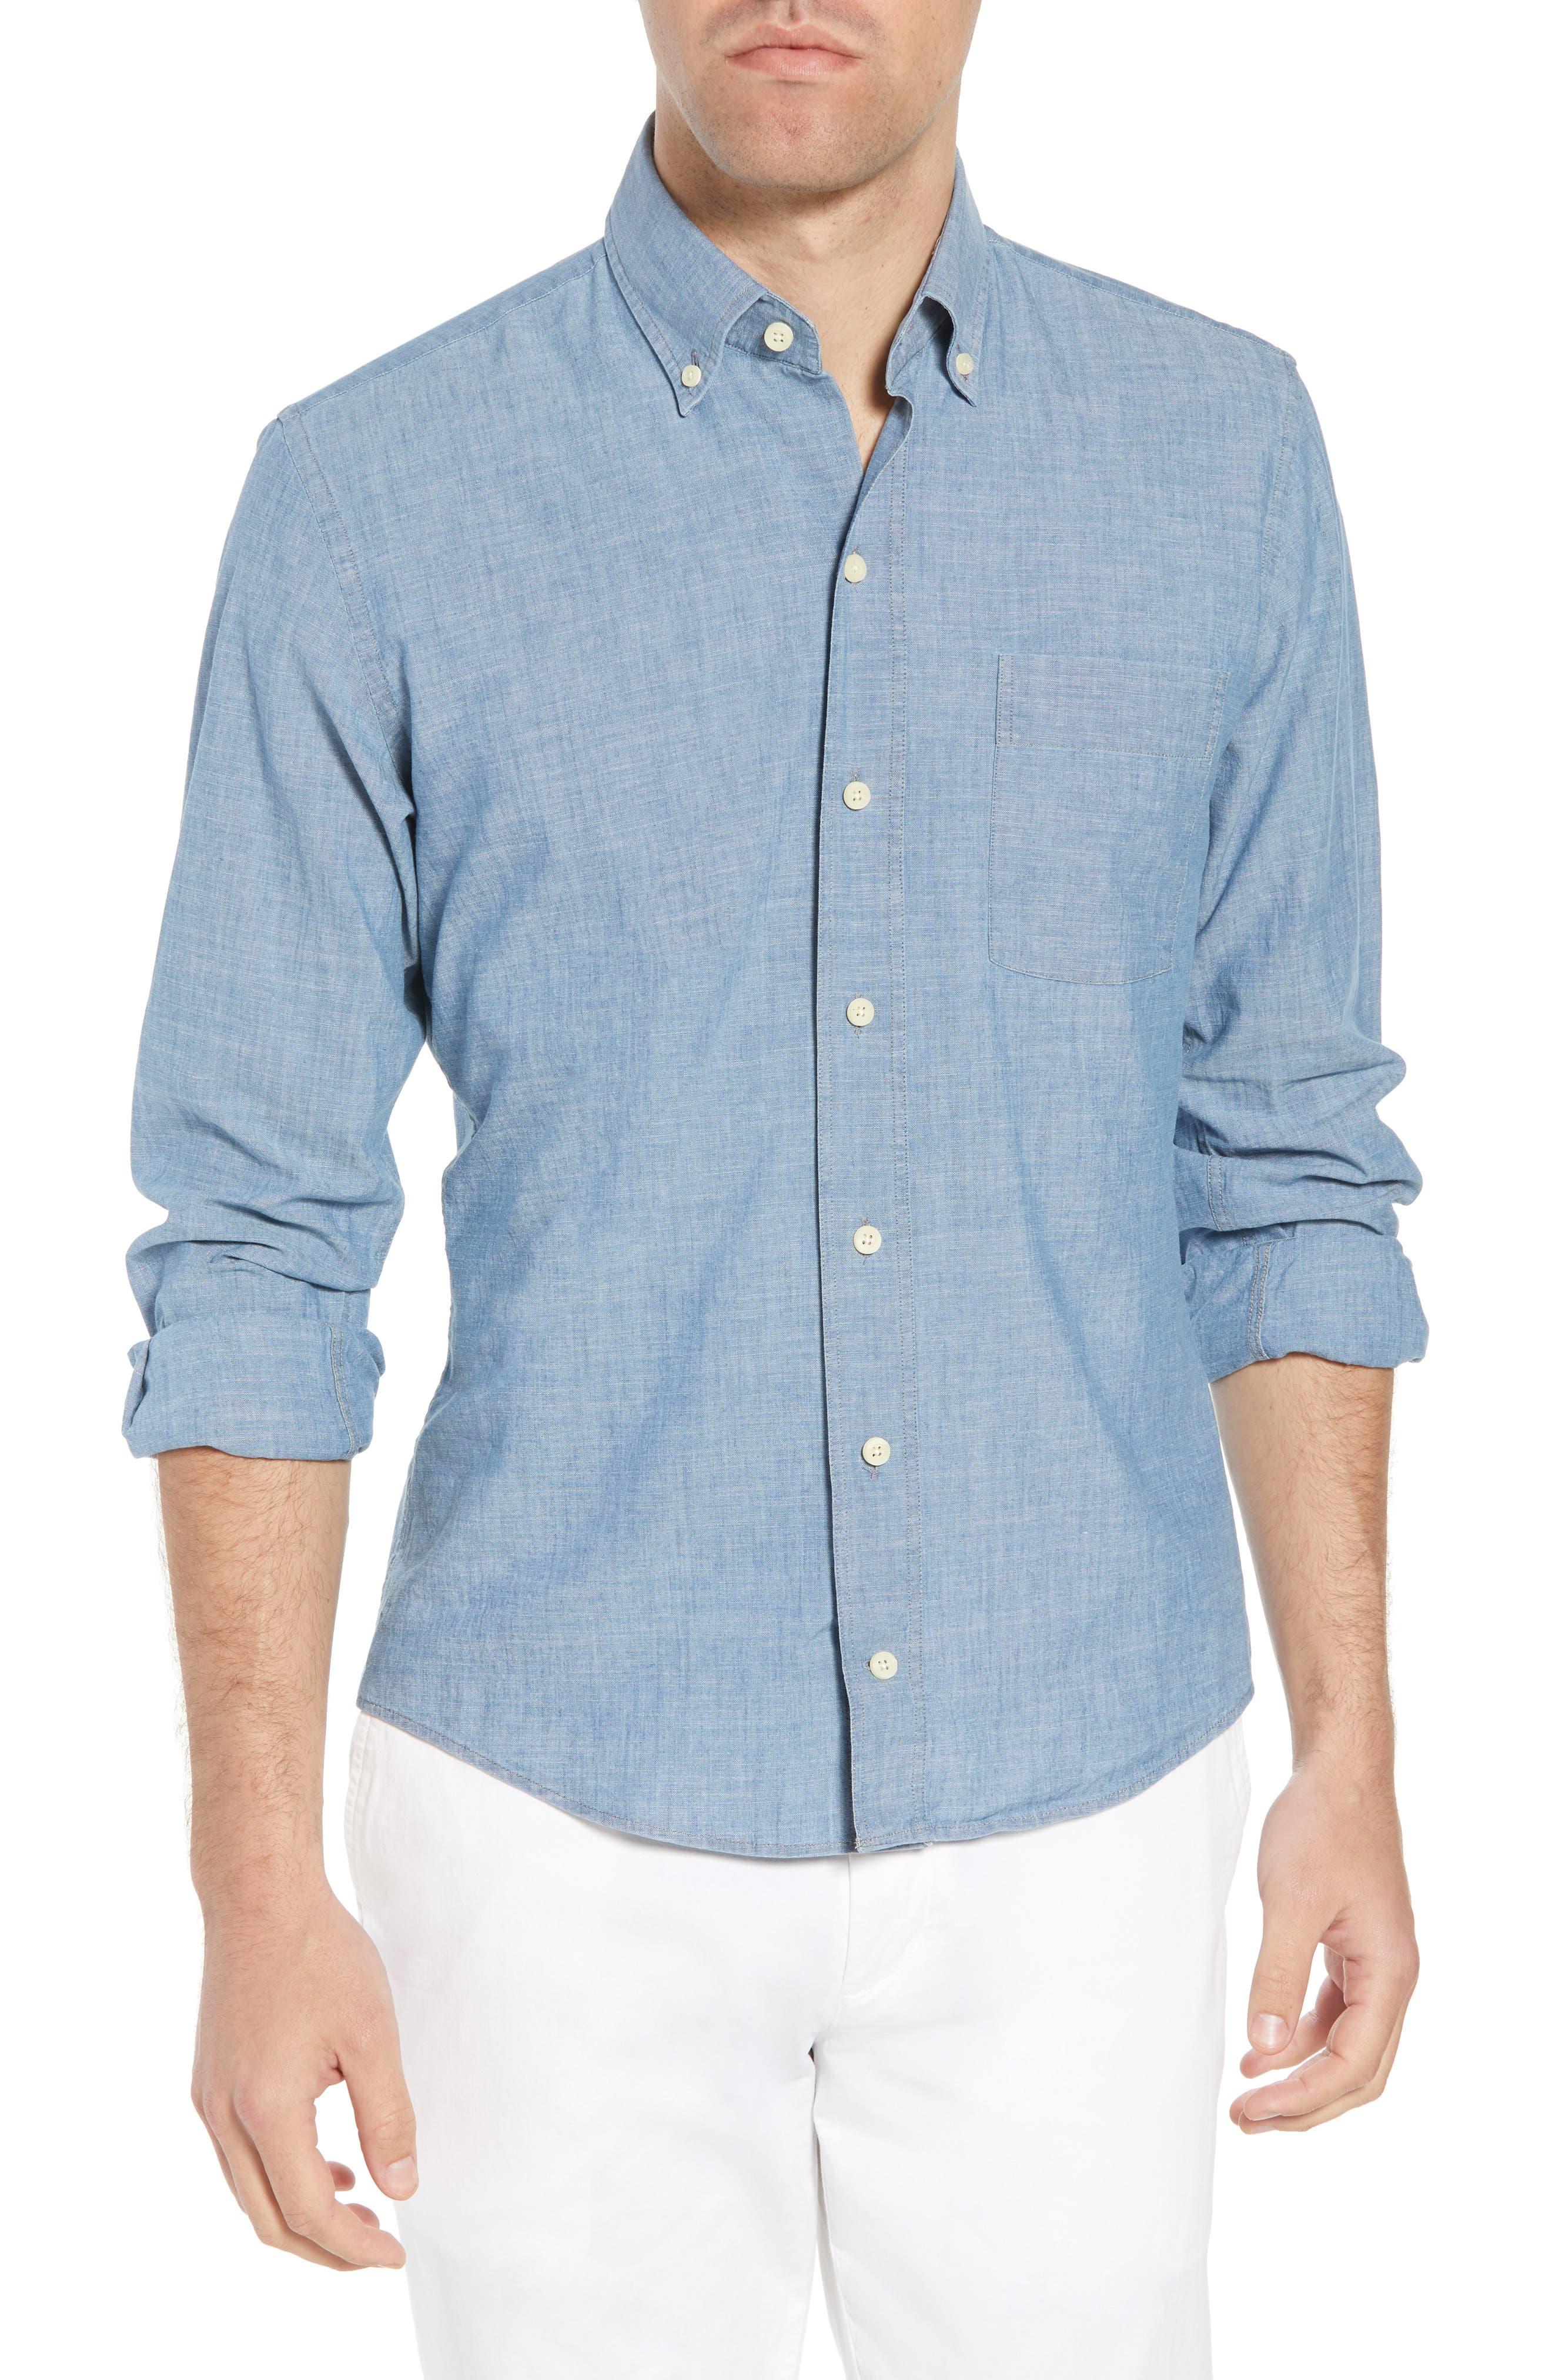 Ancroft Slim Fit Chambray Sport Shirt,                             Main thumbnail 1, color,                             Blue